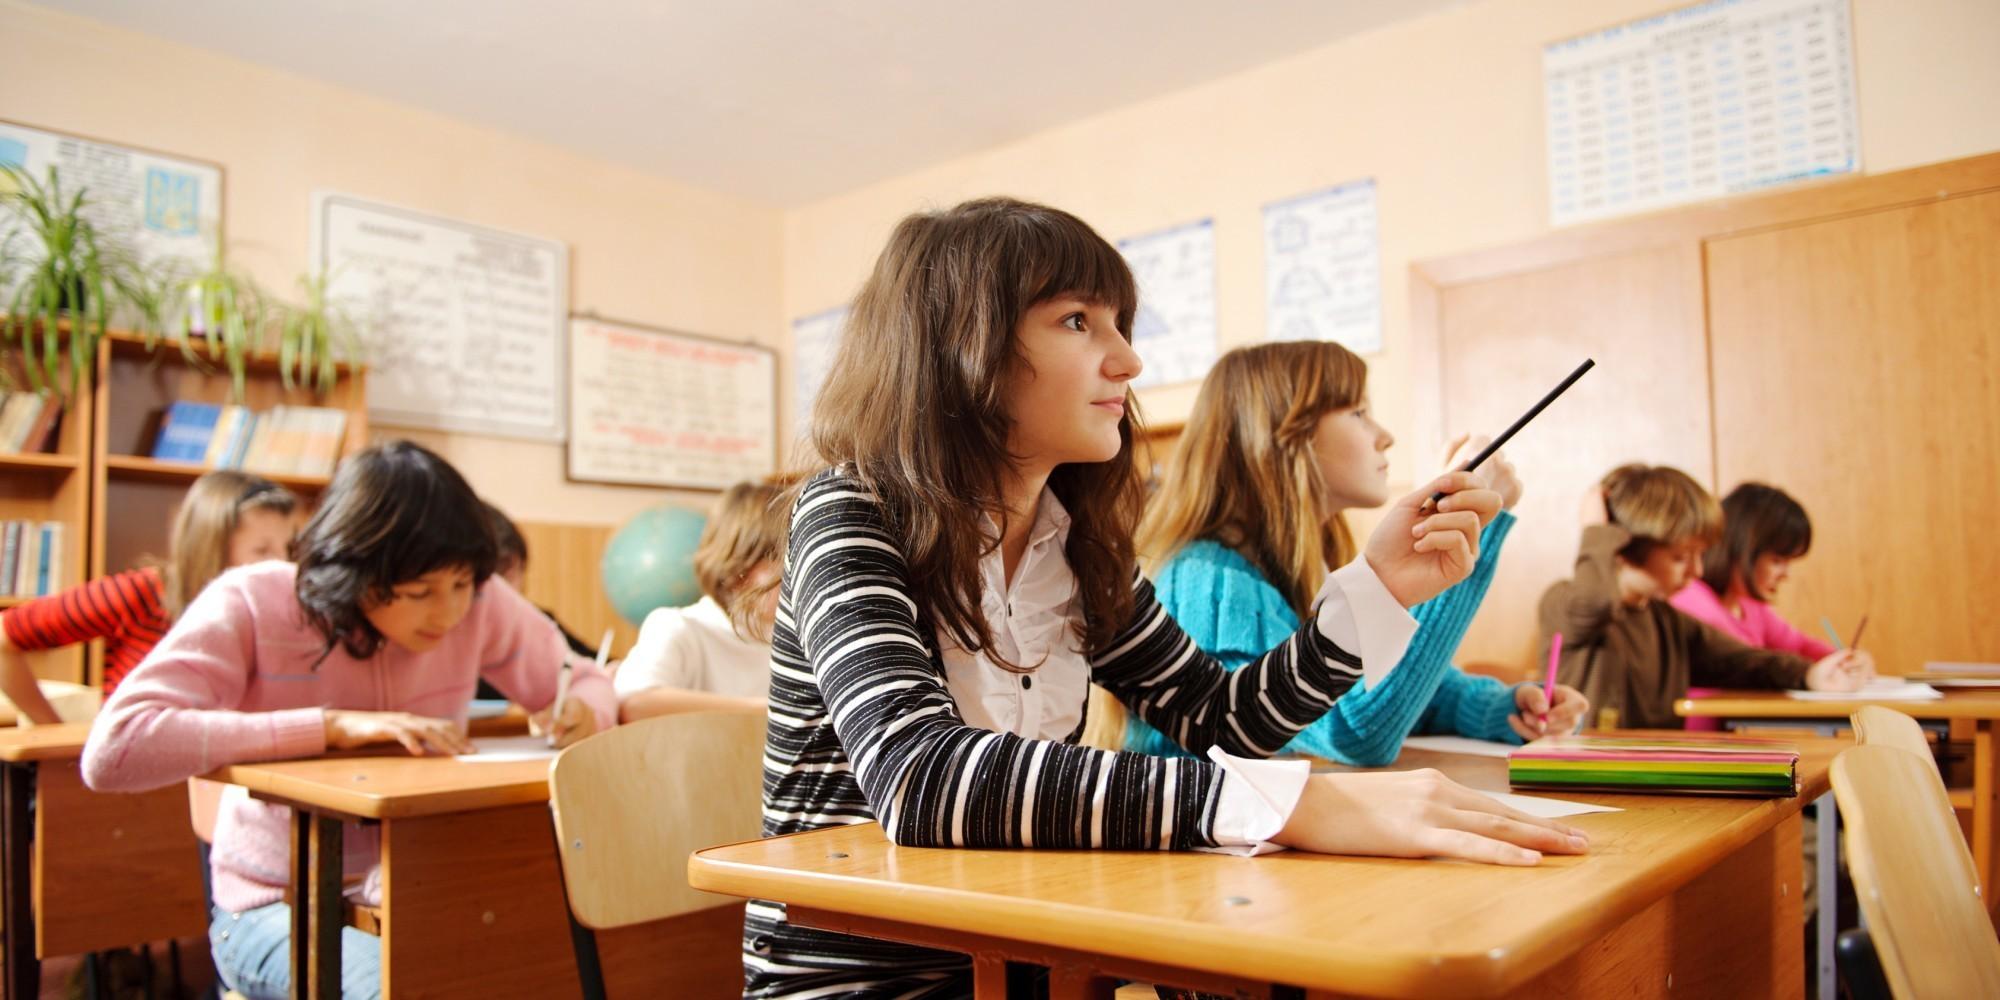 'Flipped' Classroom Has Kids Do Homework At School After Watching Online Videos